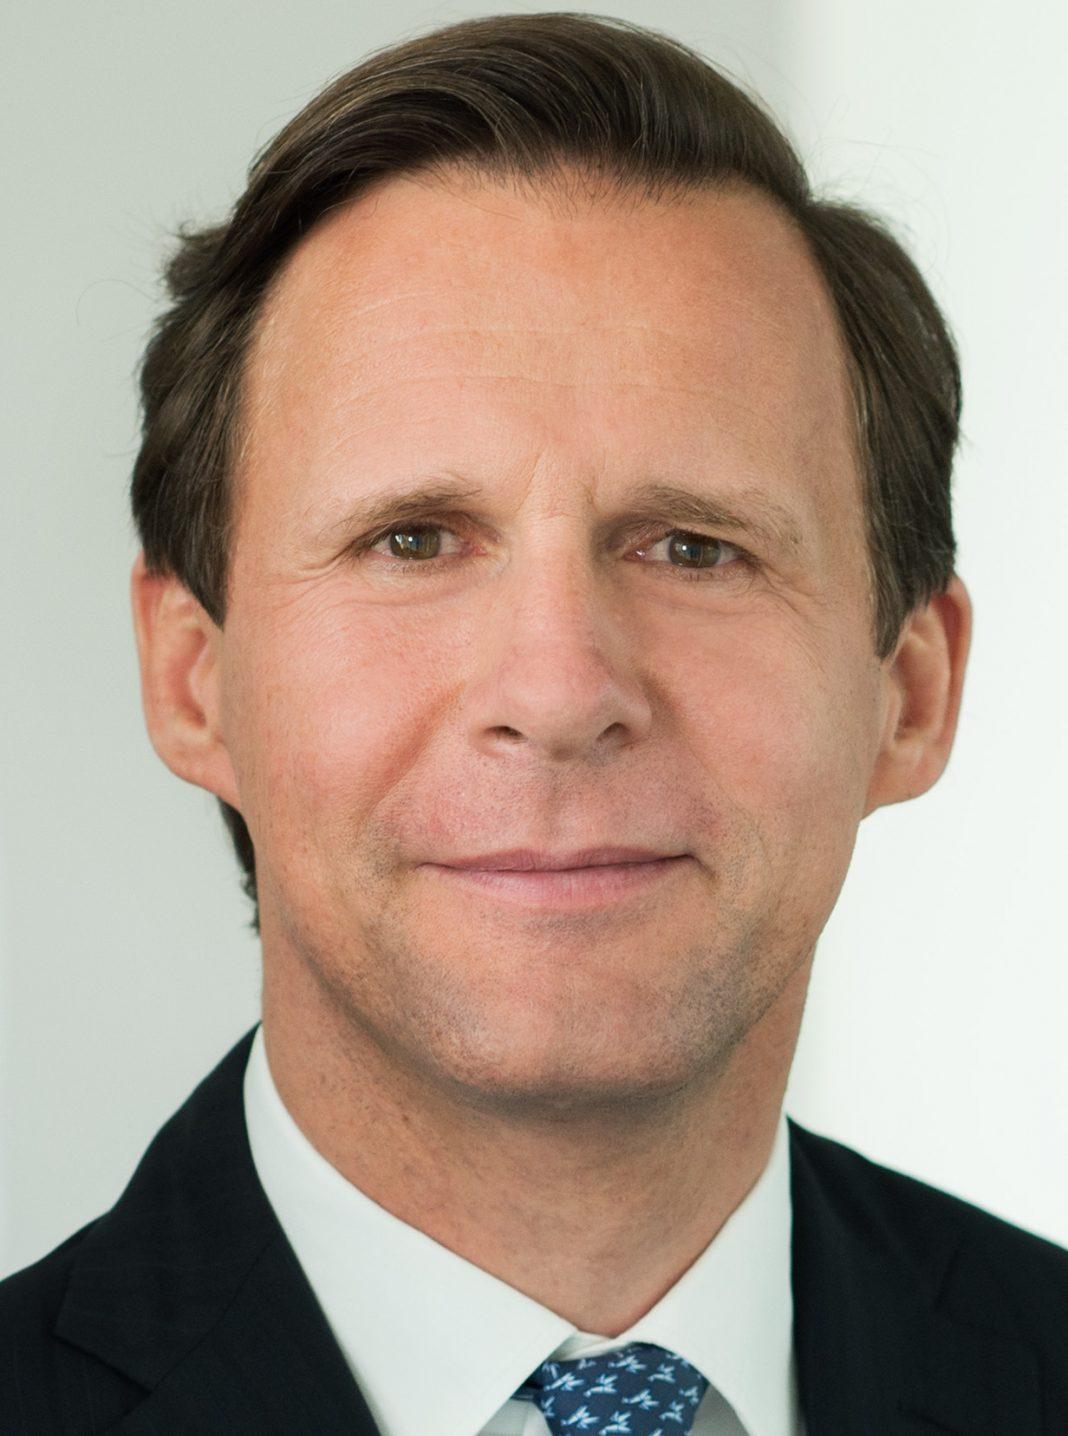 Lars Schnidrig, Corestate Capital Holding SA